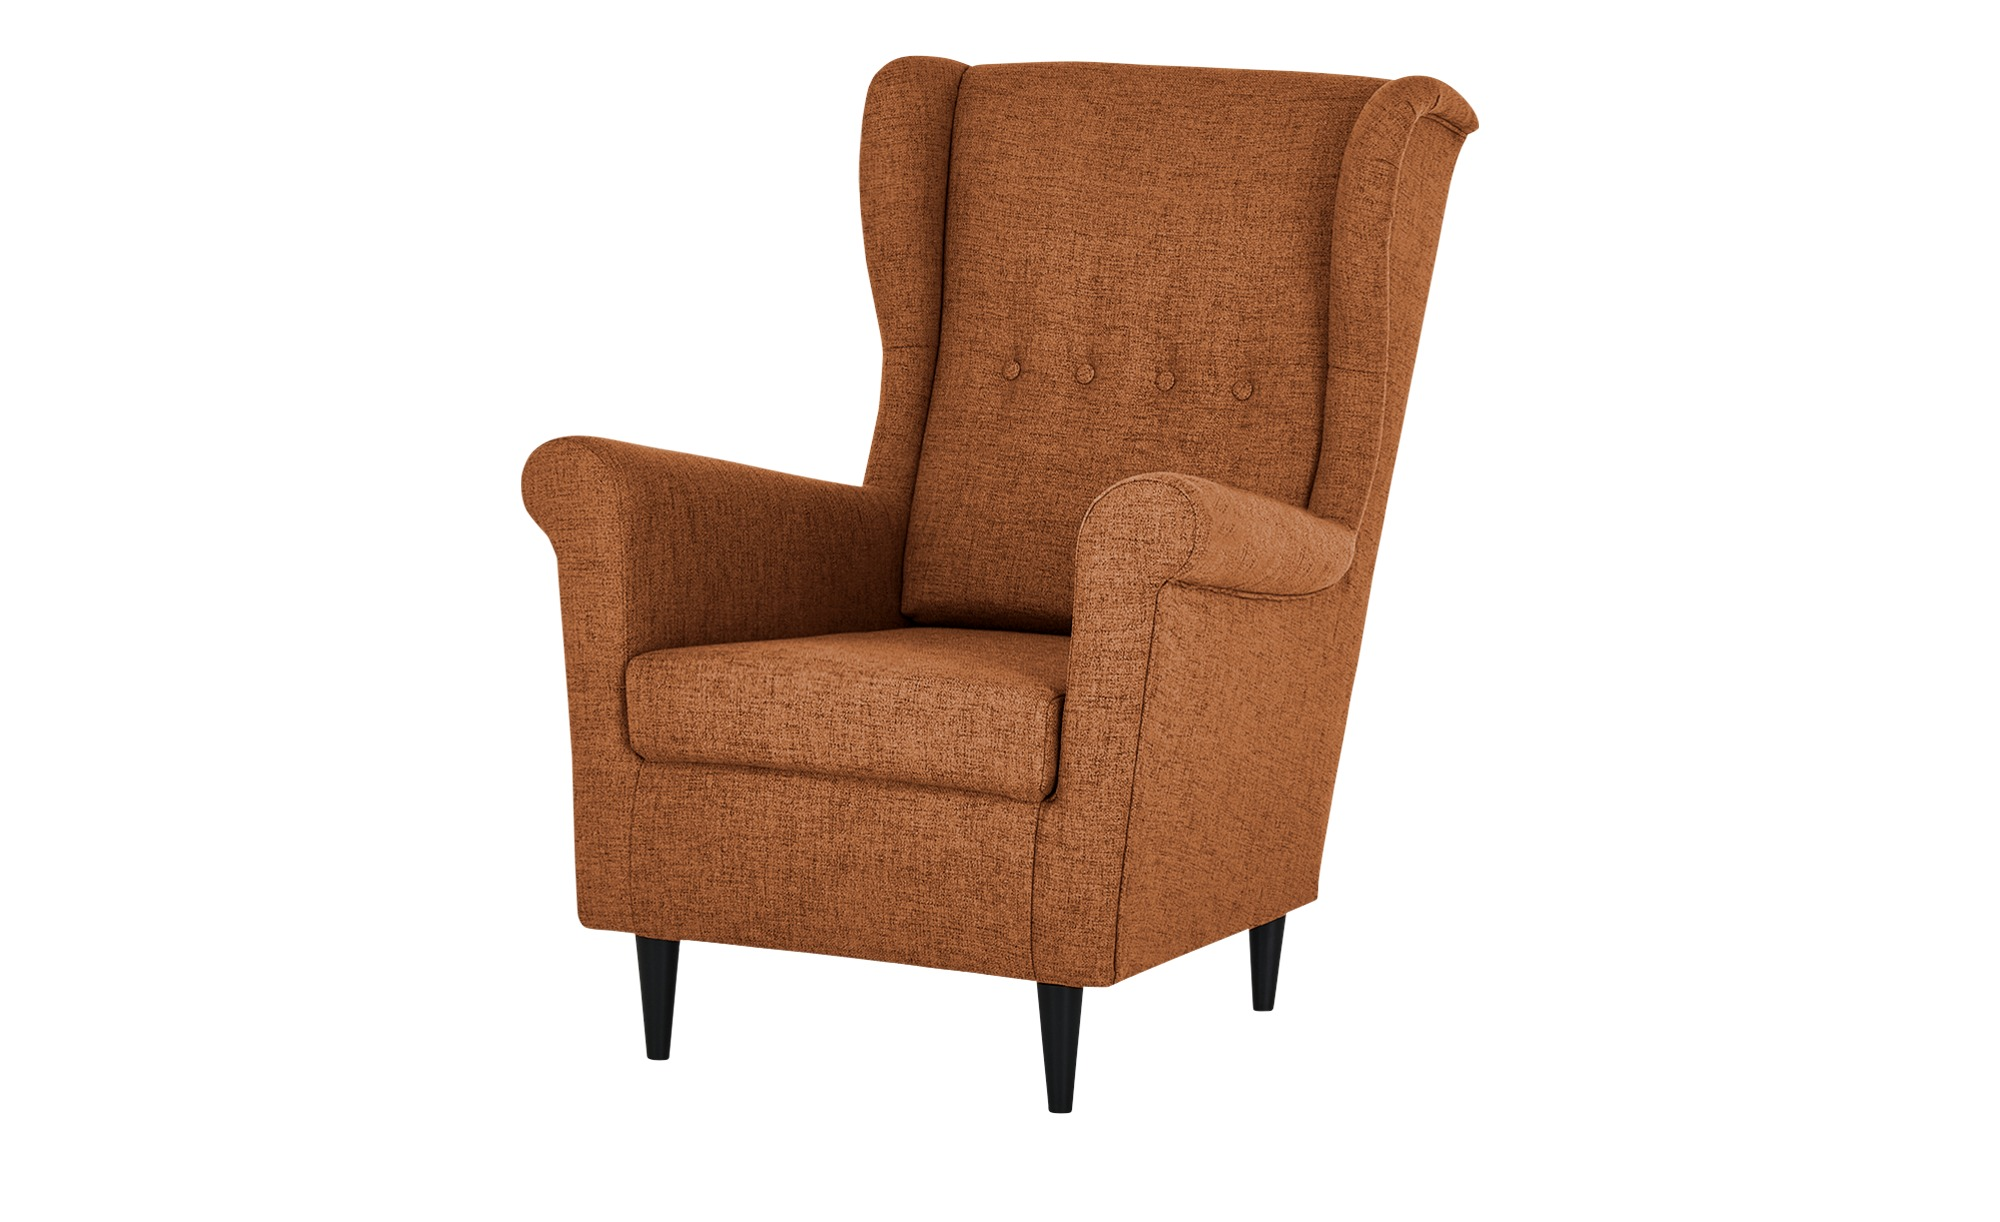 smart Sessel  Hubertine ¦ orange ¦ Maße (cm): B: 82 H: 102 T: 89 Polstermöbel > Sessel > Ohrensessel - Höffner